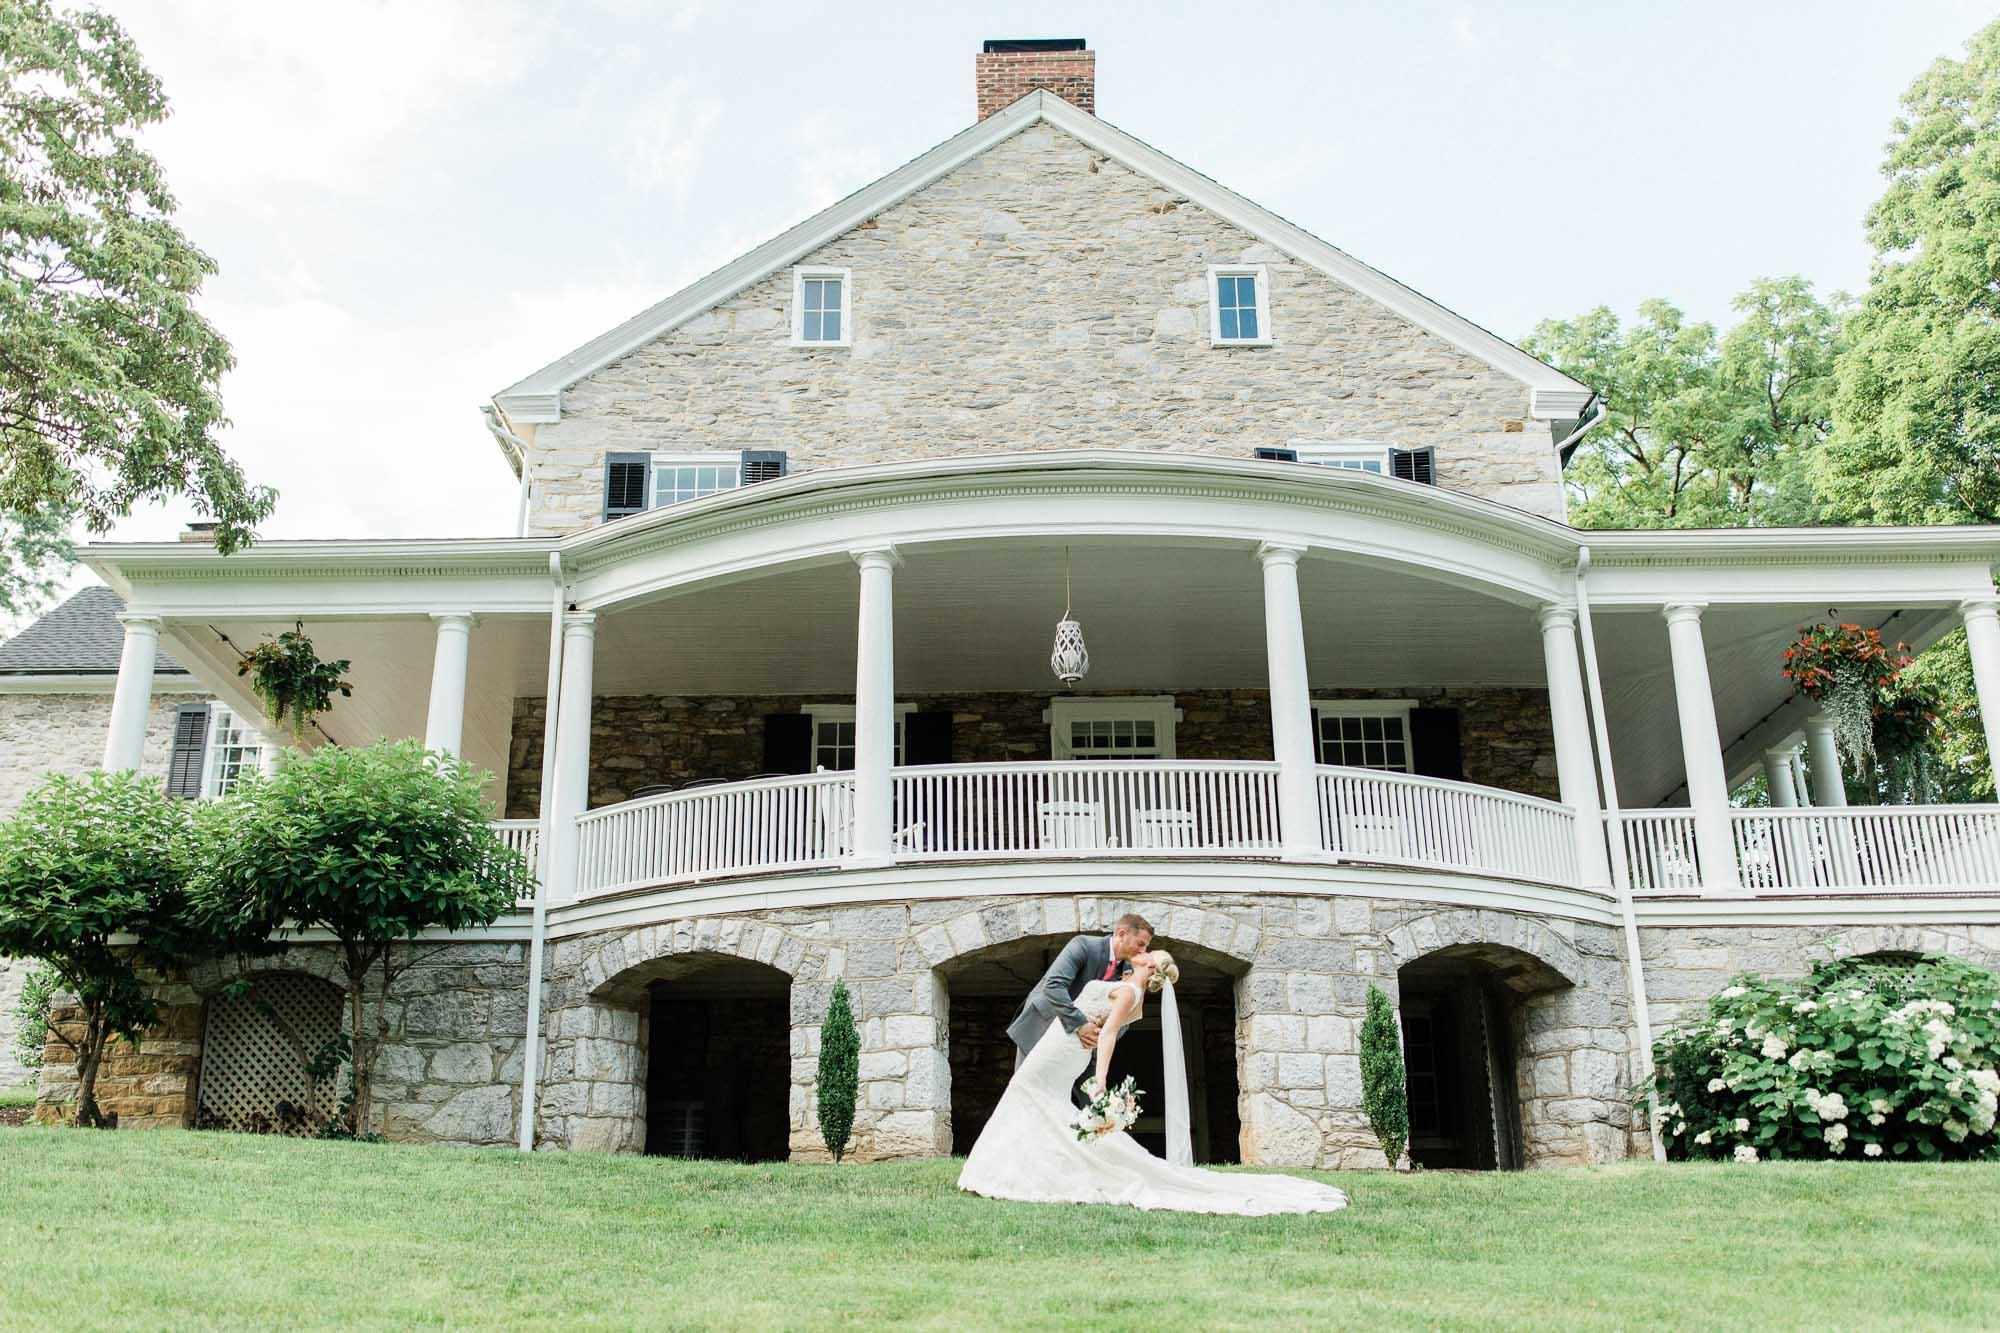 Allenberry-resort-historic-pennsylvania-wedding-10281.jpg